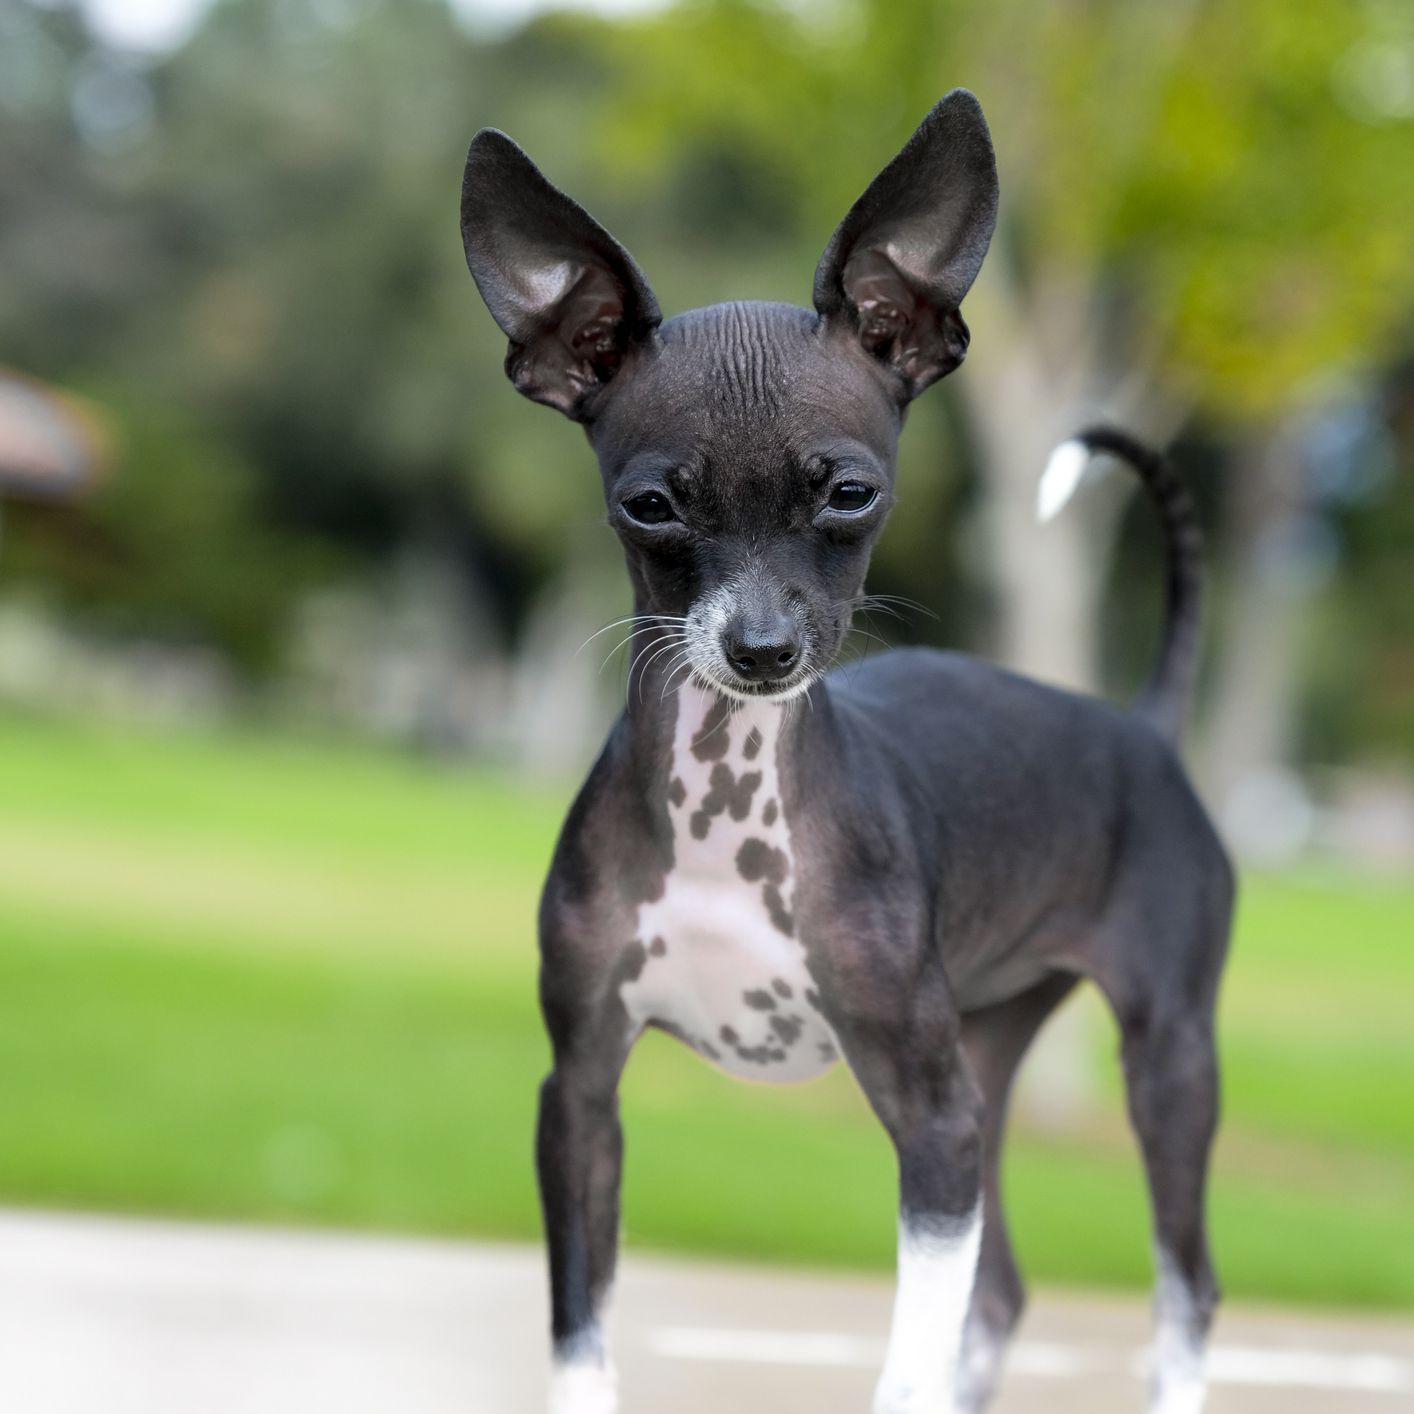 A hairless chihuahua puppy